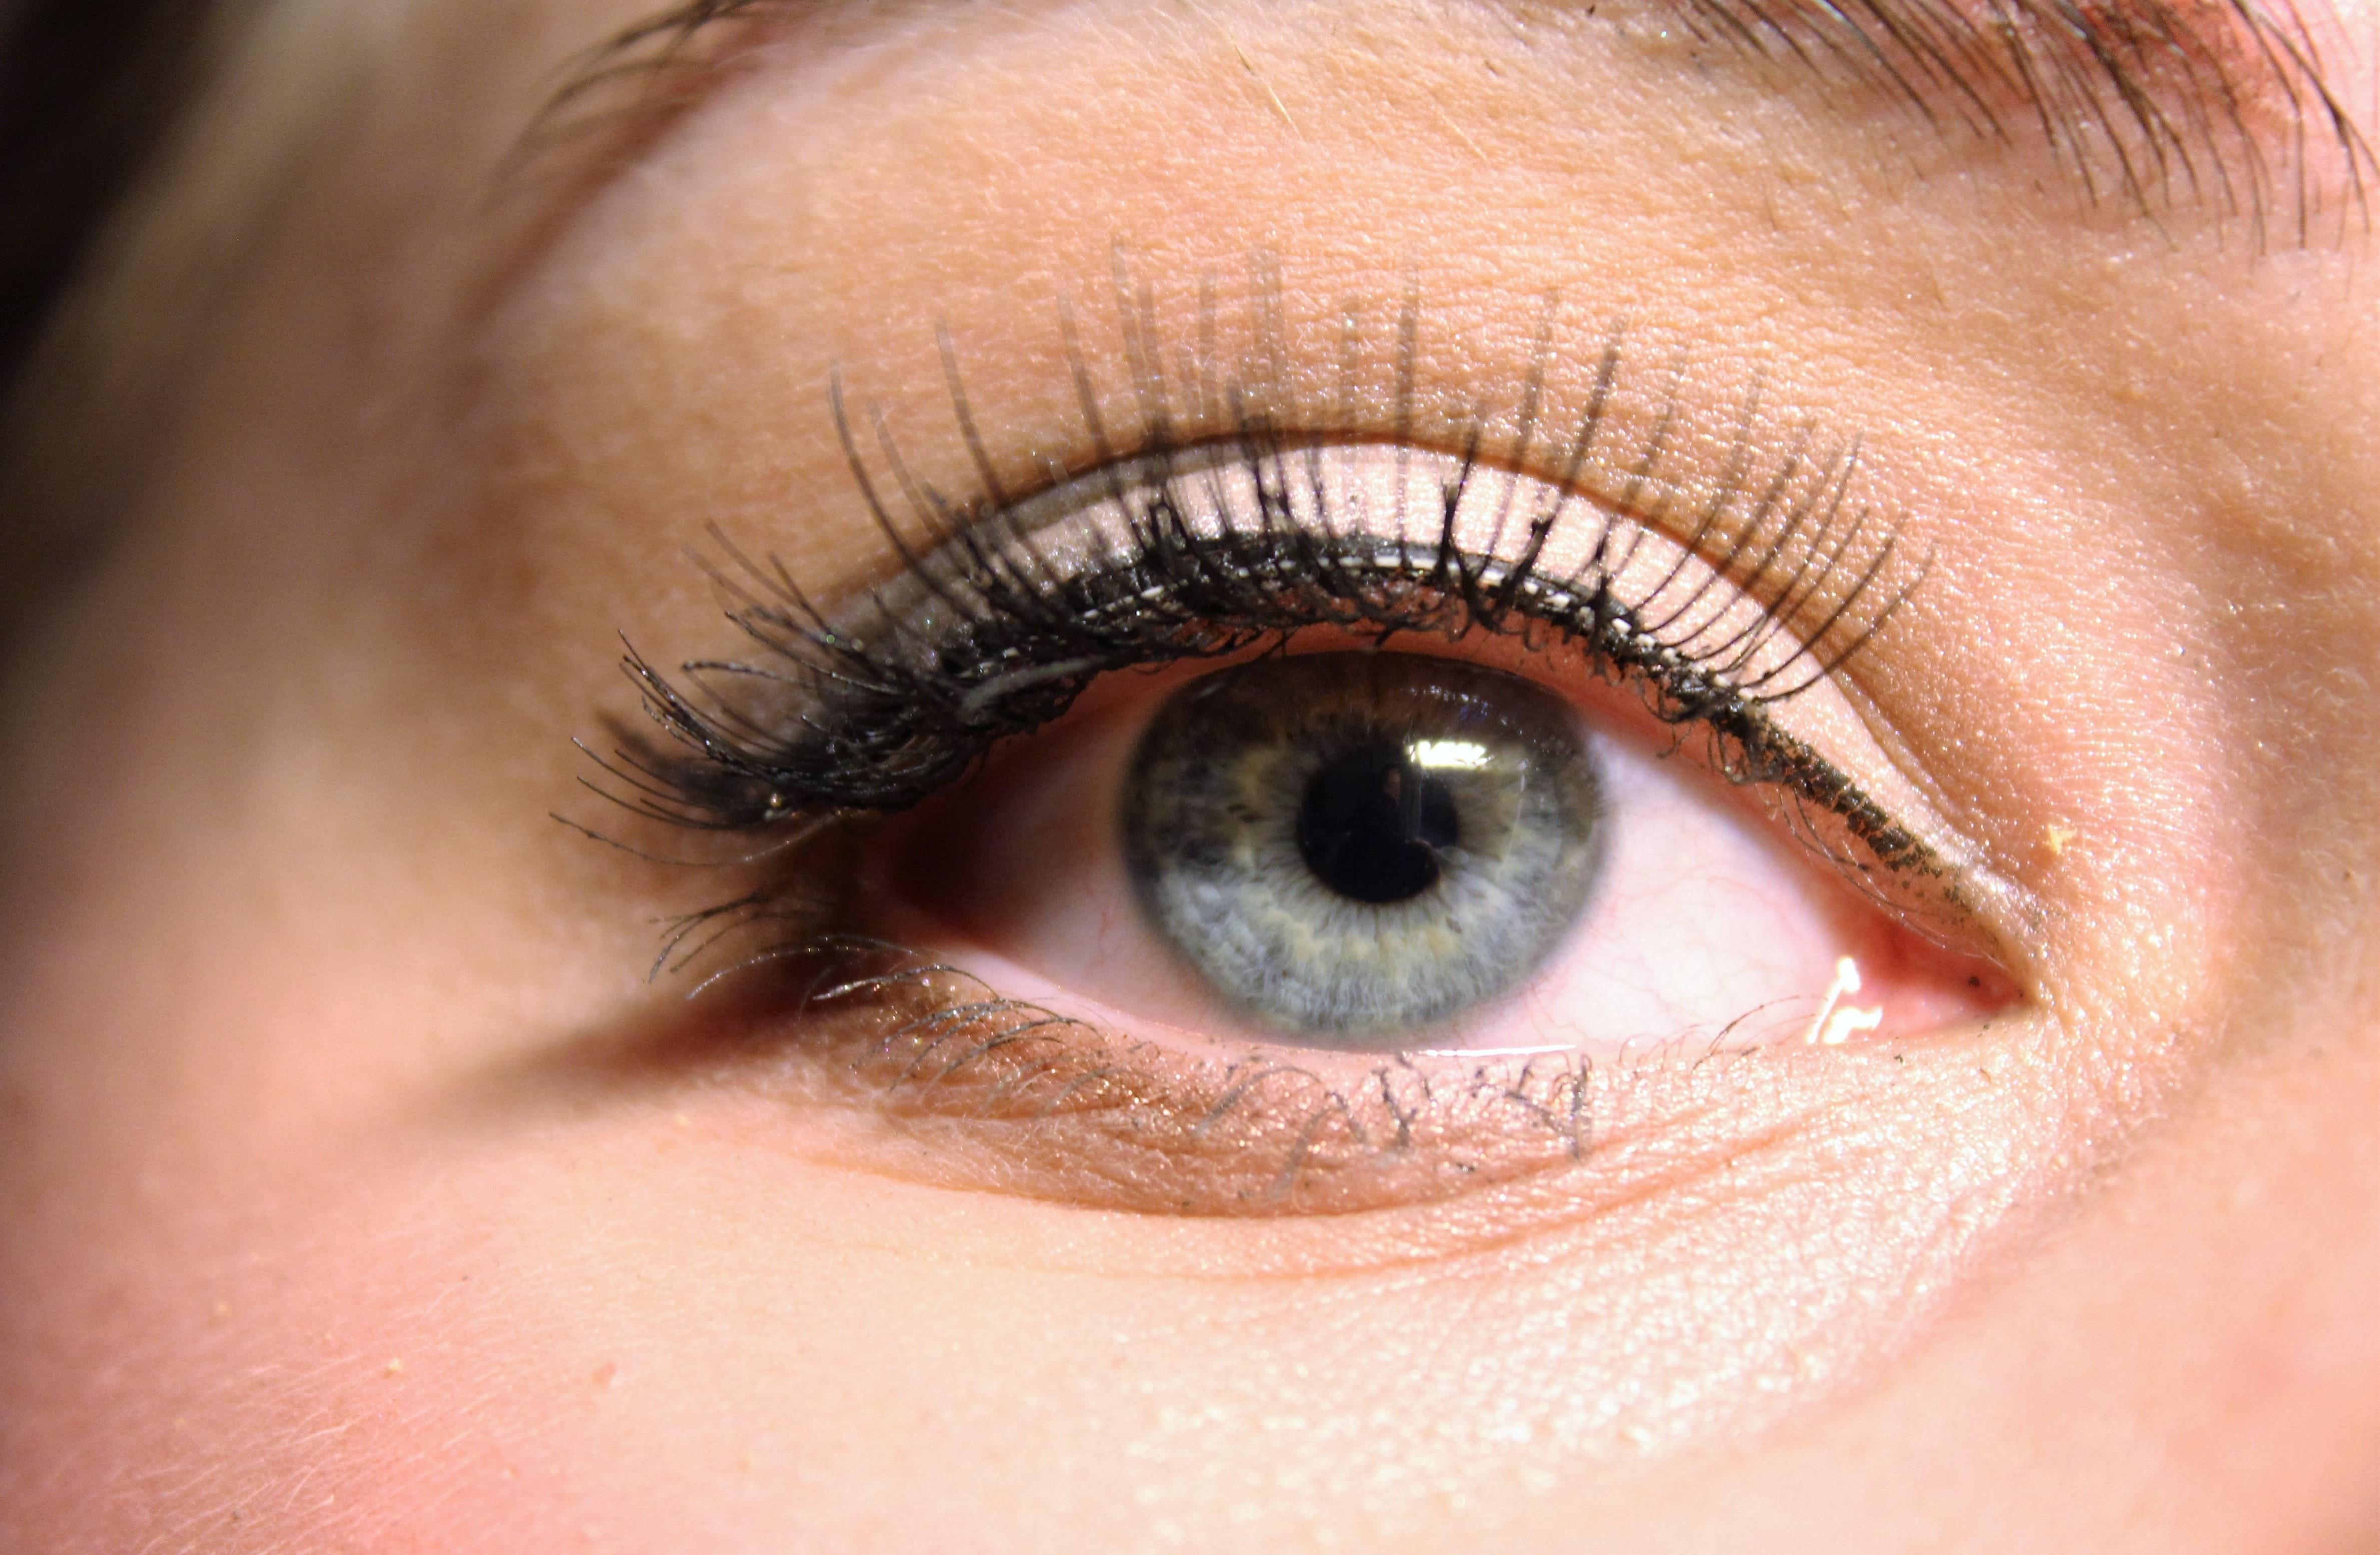 99f6536f491 blue makeup eyebrow mouth eyelash close up human body face nose cheek eye  head organ cosmetics